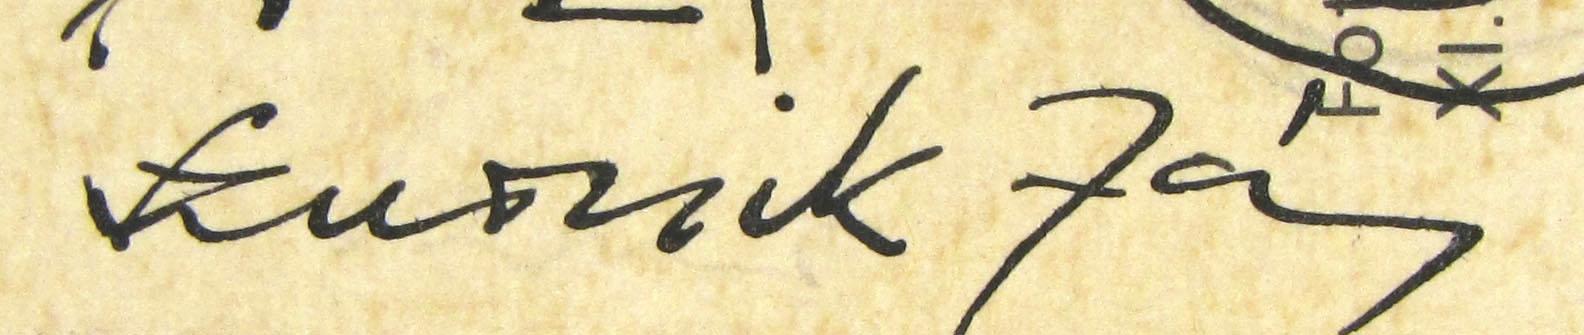 72-237s.jpg (1584�335)